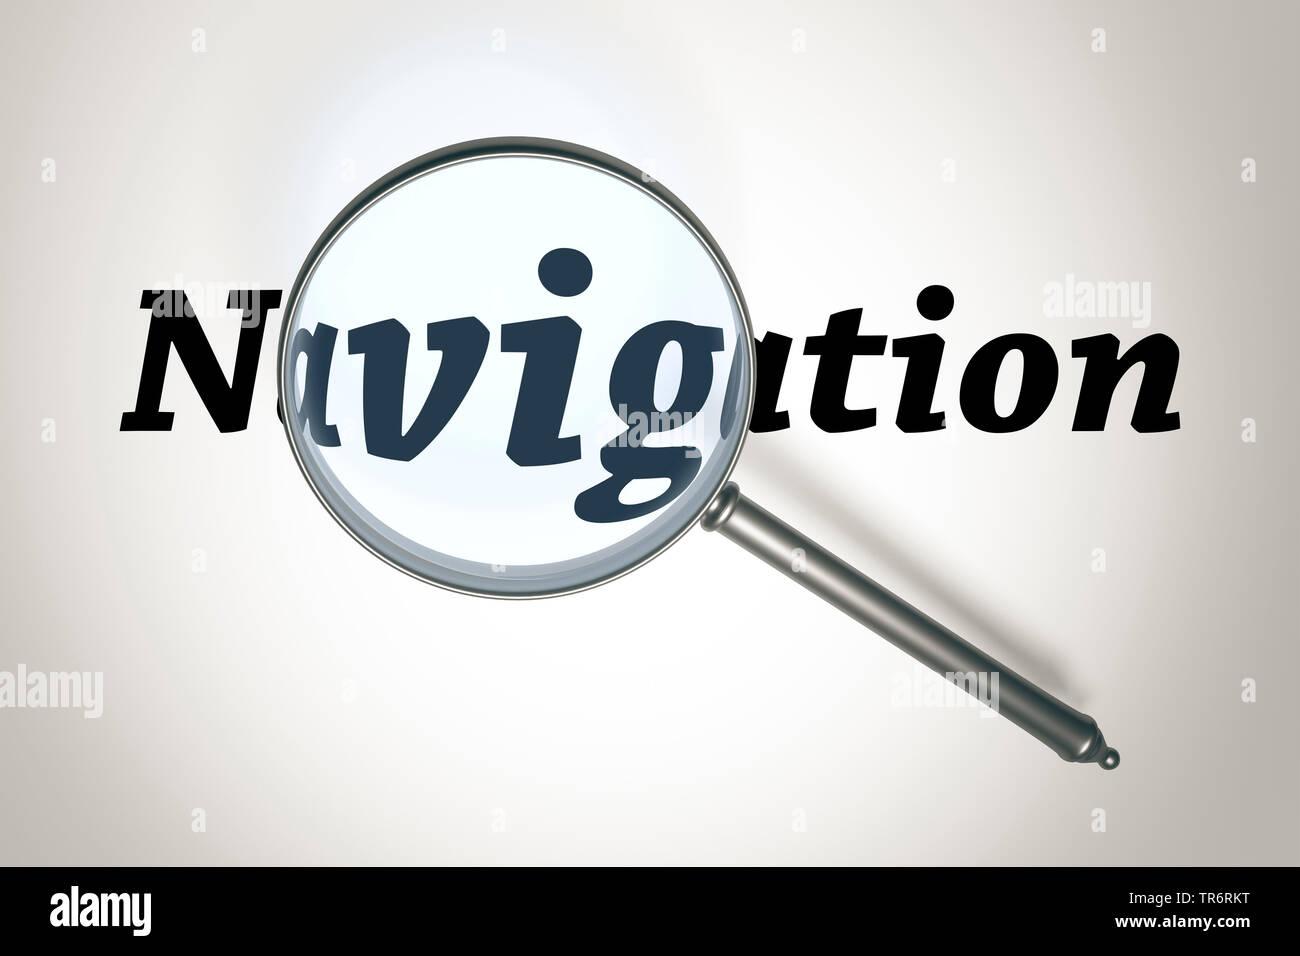 Lupe vergroessert das Wort Navigation   magnifying glass with the word Navigation   BLWS489733.jpg [ (c) blickwinkel/McPHOTO/M. Gann Tel. +49 (0)2302- - Stock Image